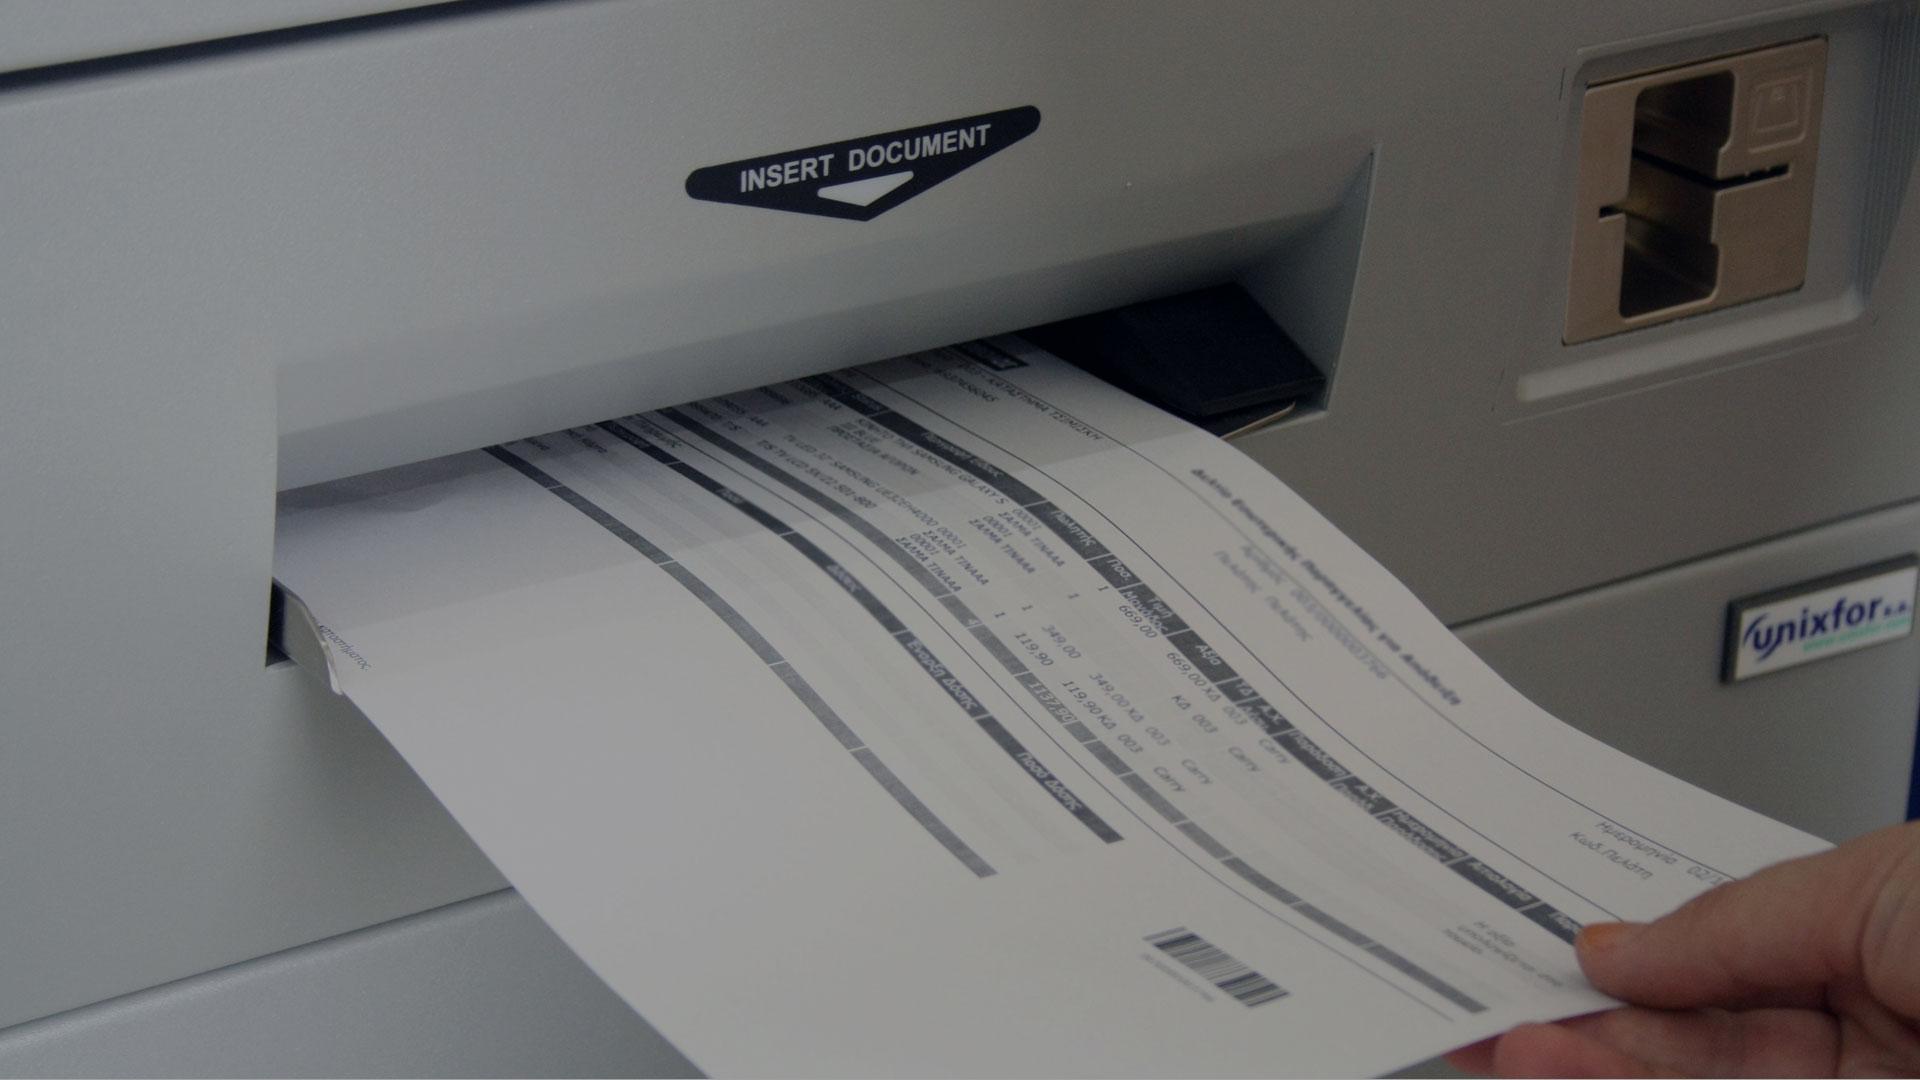 Self Service Document Scanning & Deposit